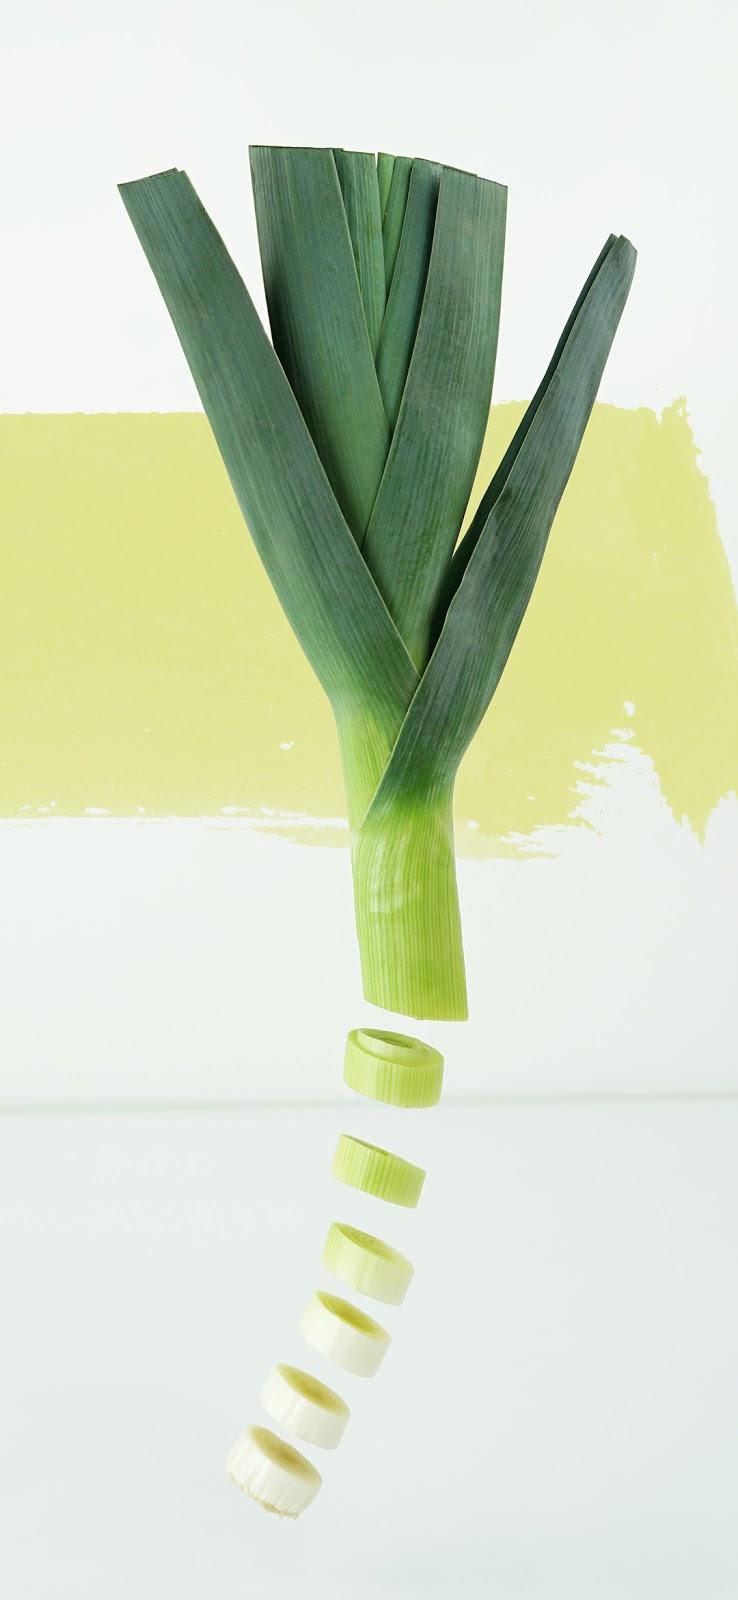 Green sliced onion